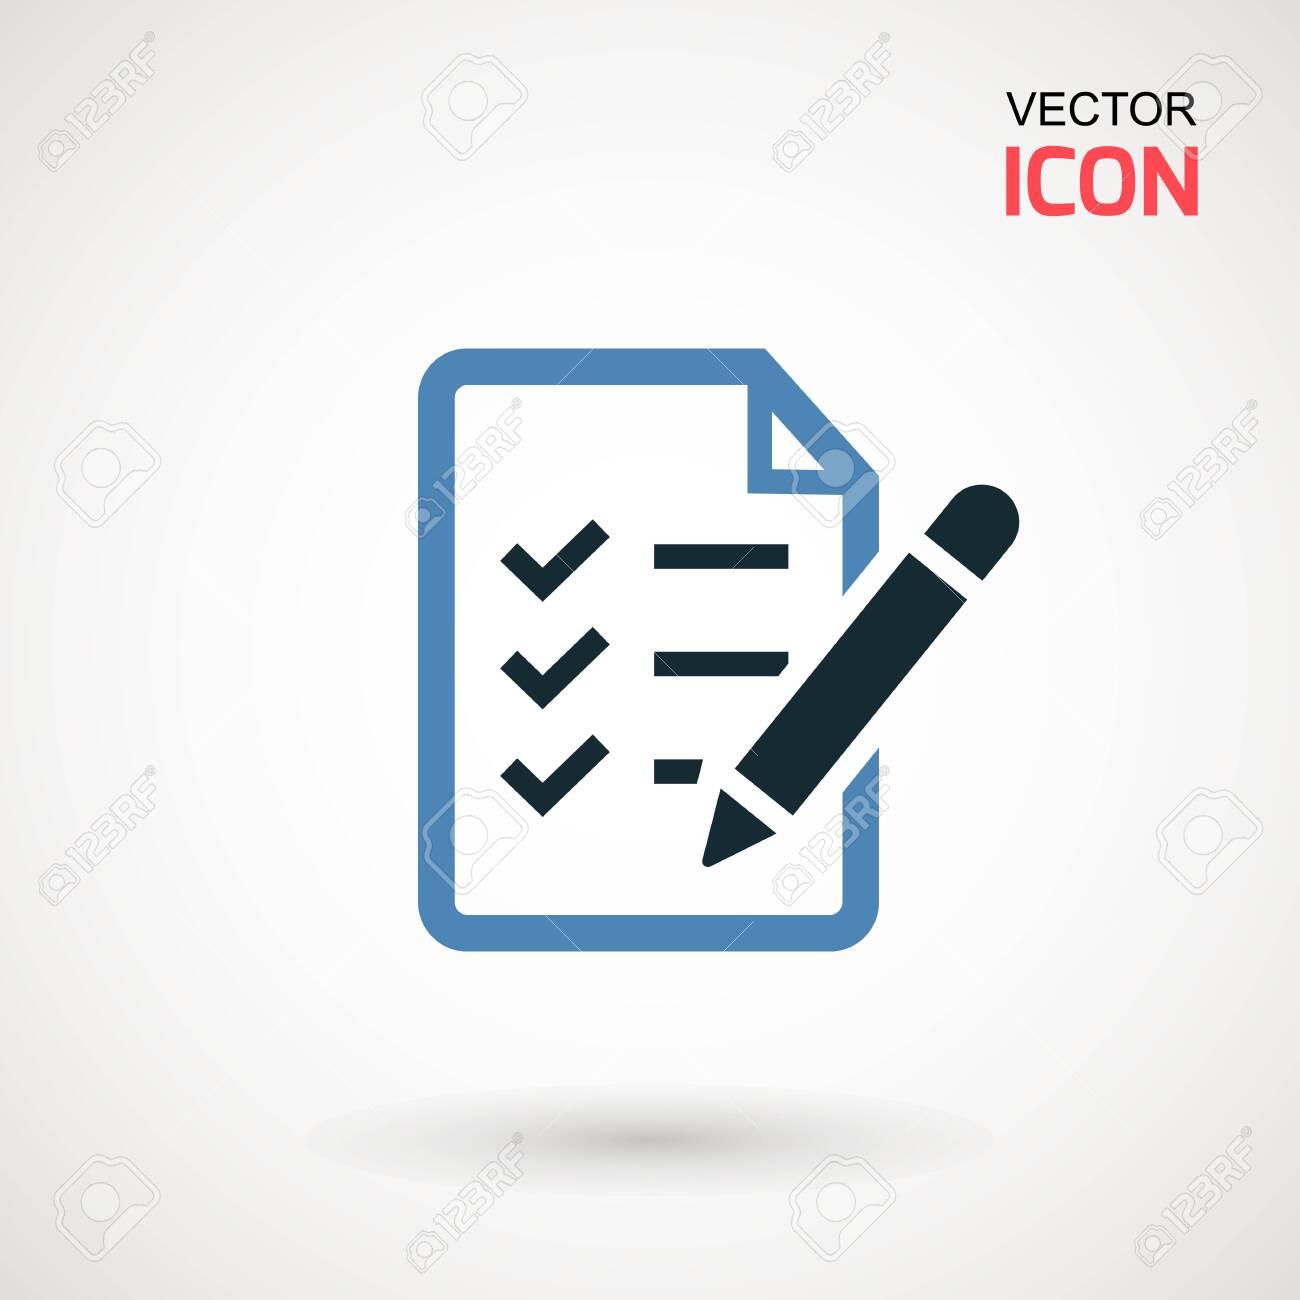 Checklist icon. Declarations linear icon. Flat illustration of clipboard with checklist - 123403252